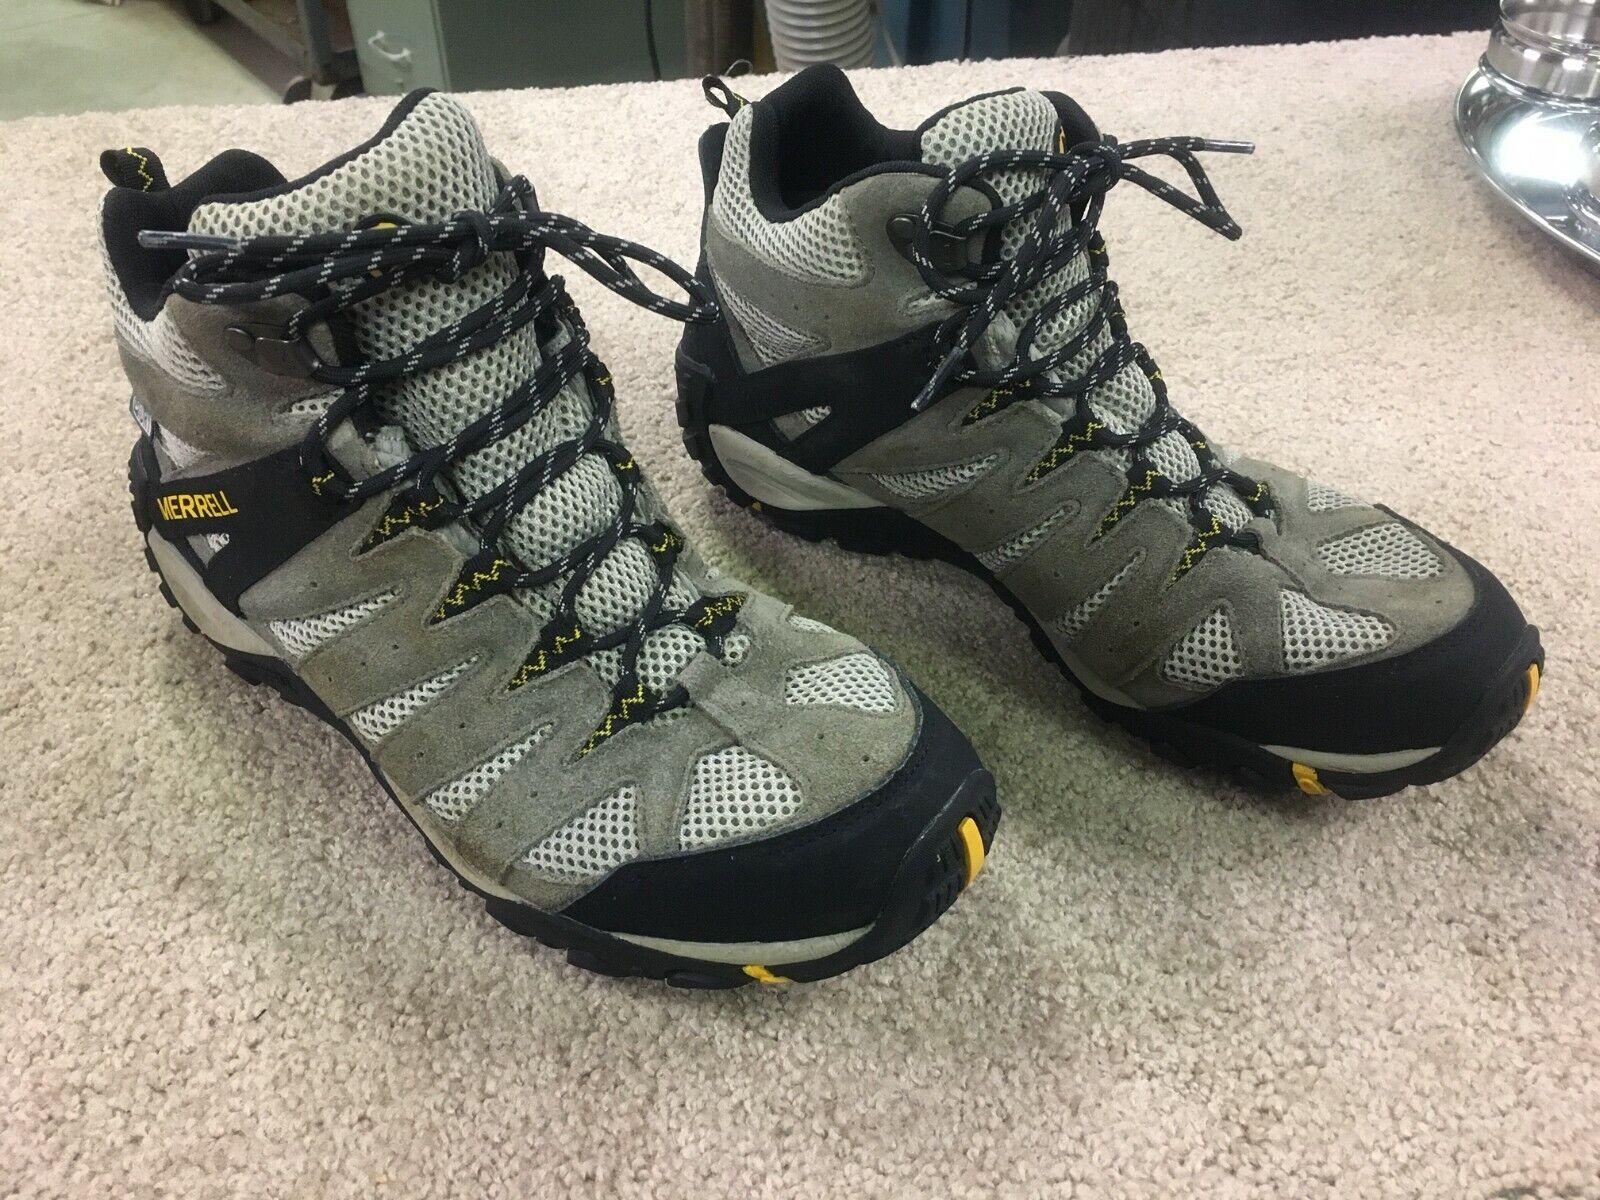 Mid Vent Waterproof Hiking Boots J50829